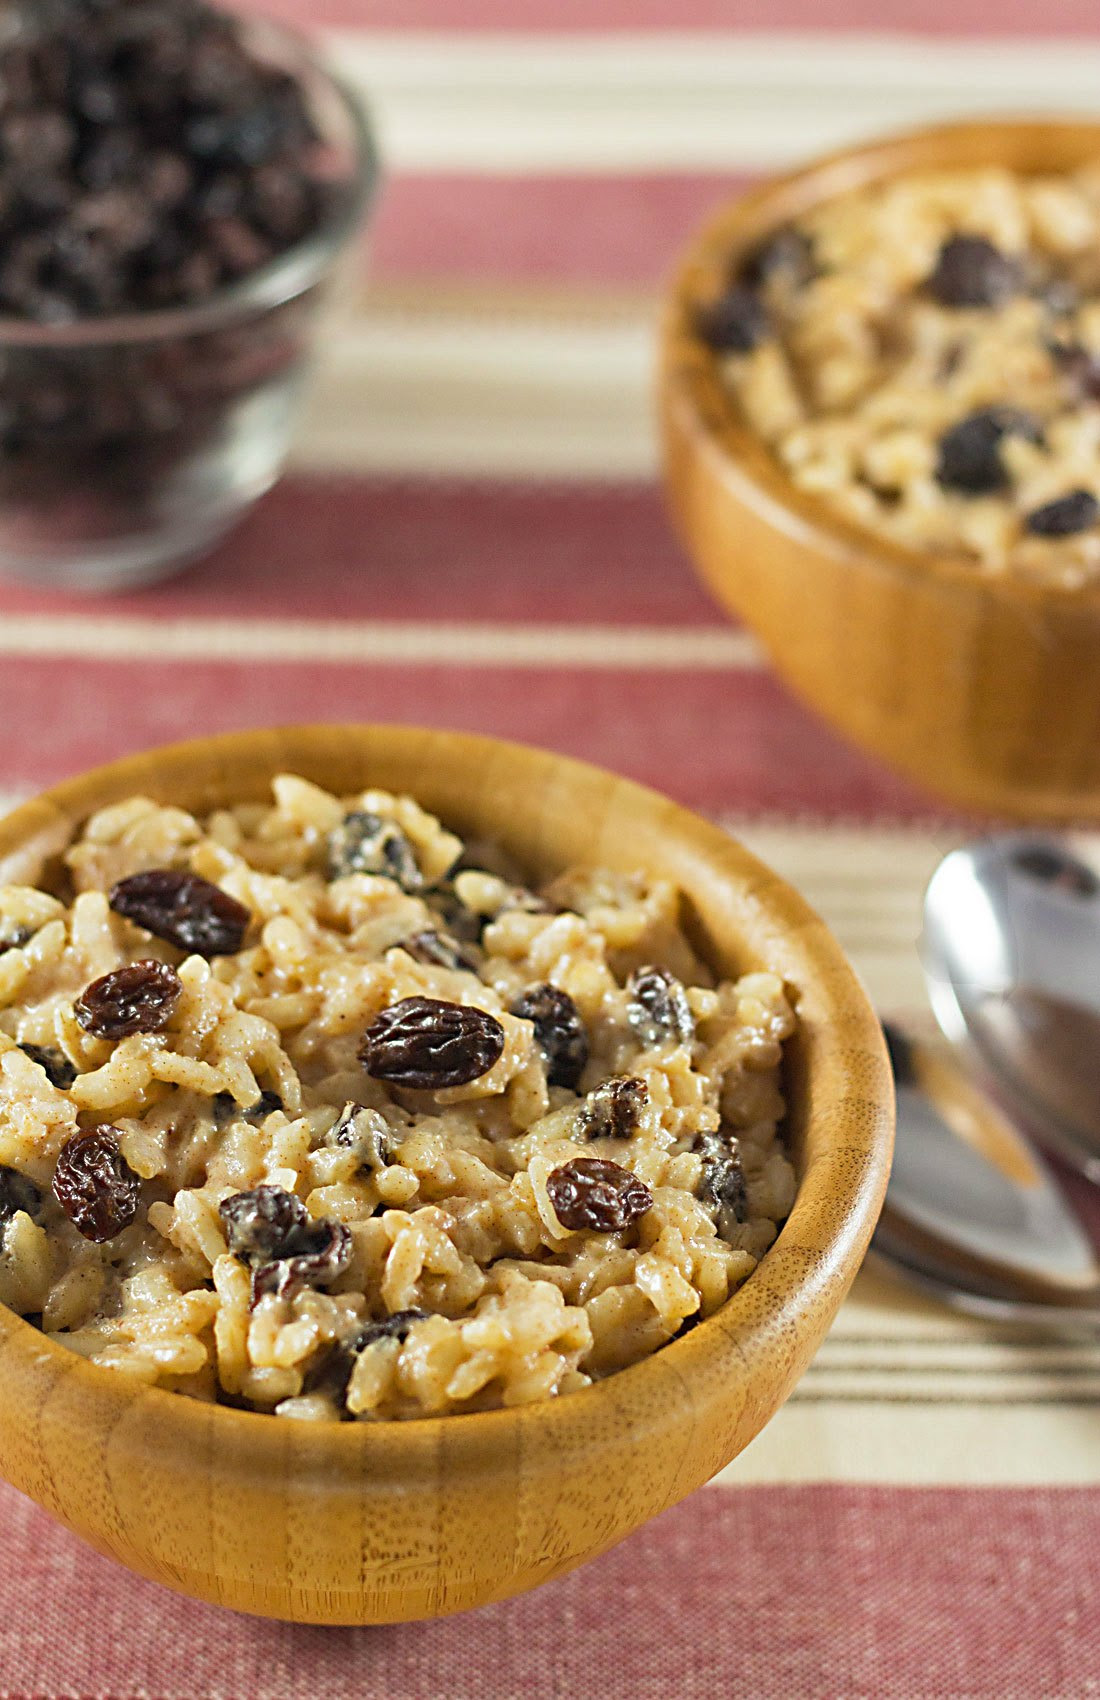 Easy Eggnog-Raisin Rice Pudding ⋆ Its Yummi